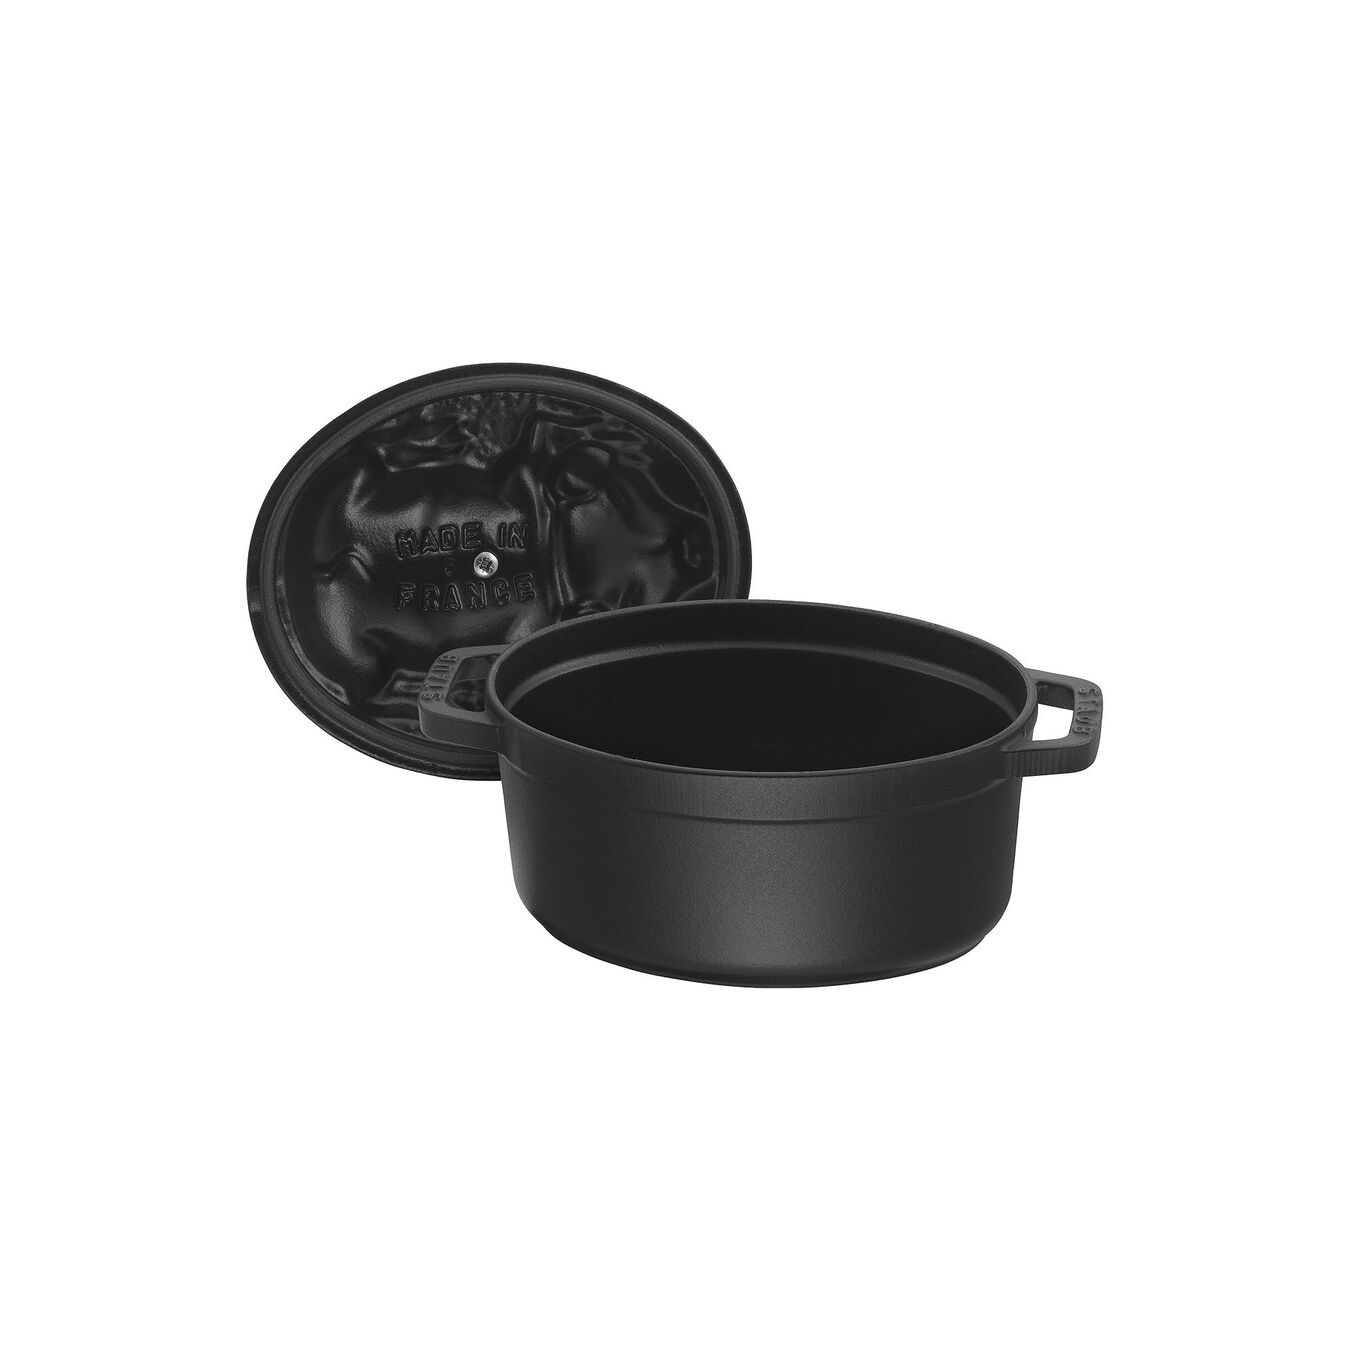 1 l Cast iron oval Faitout, Black,,large 6